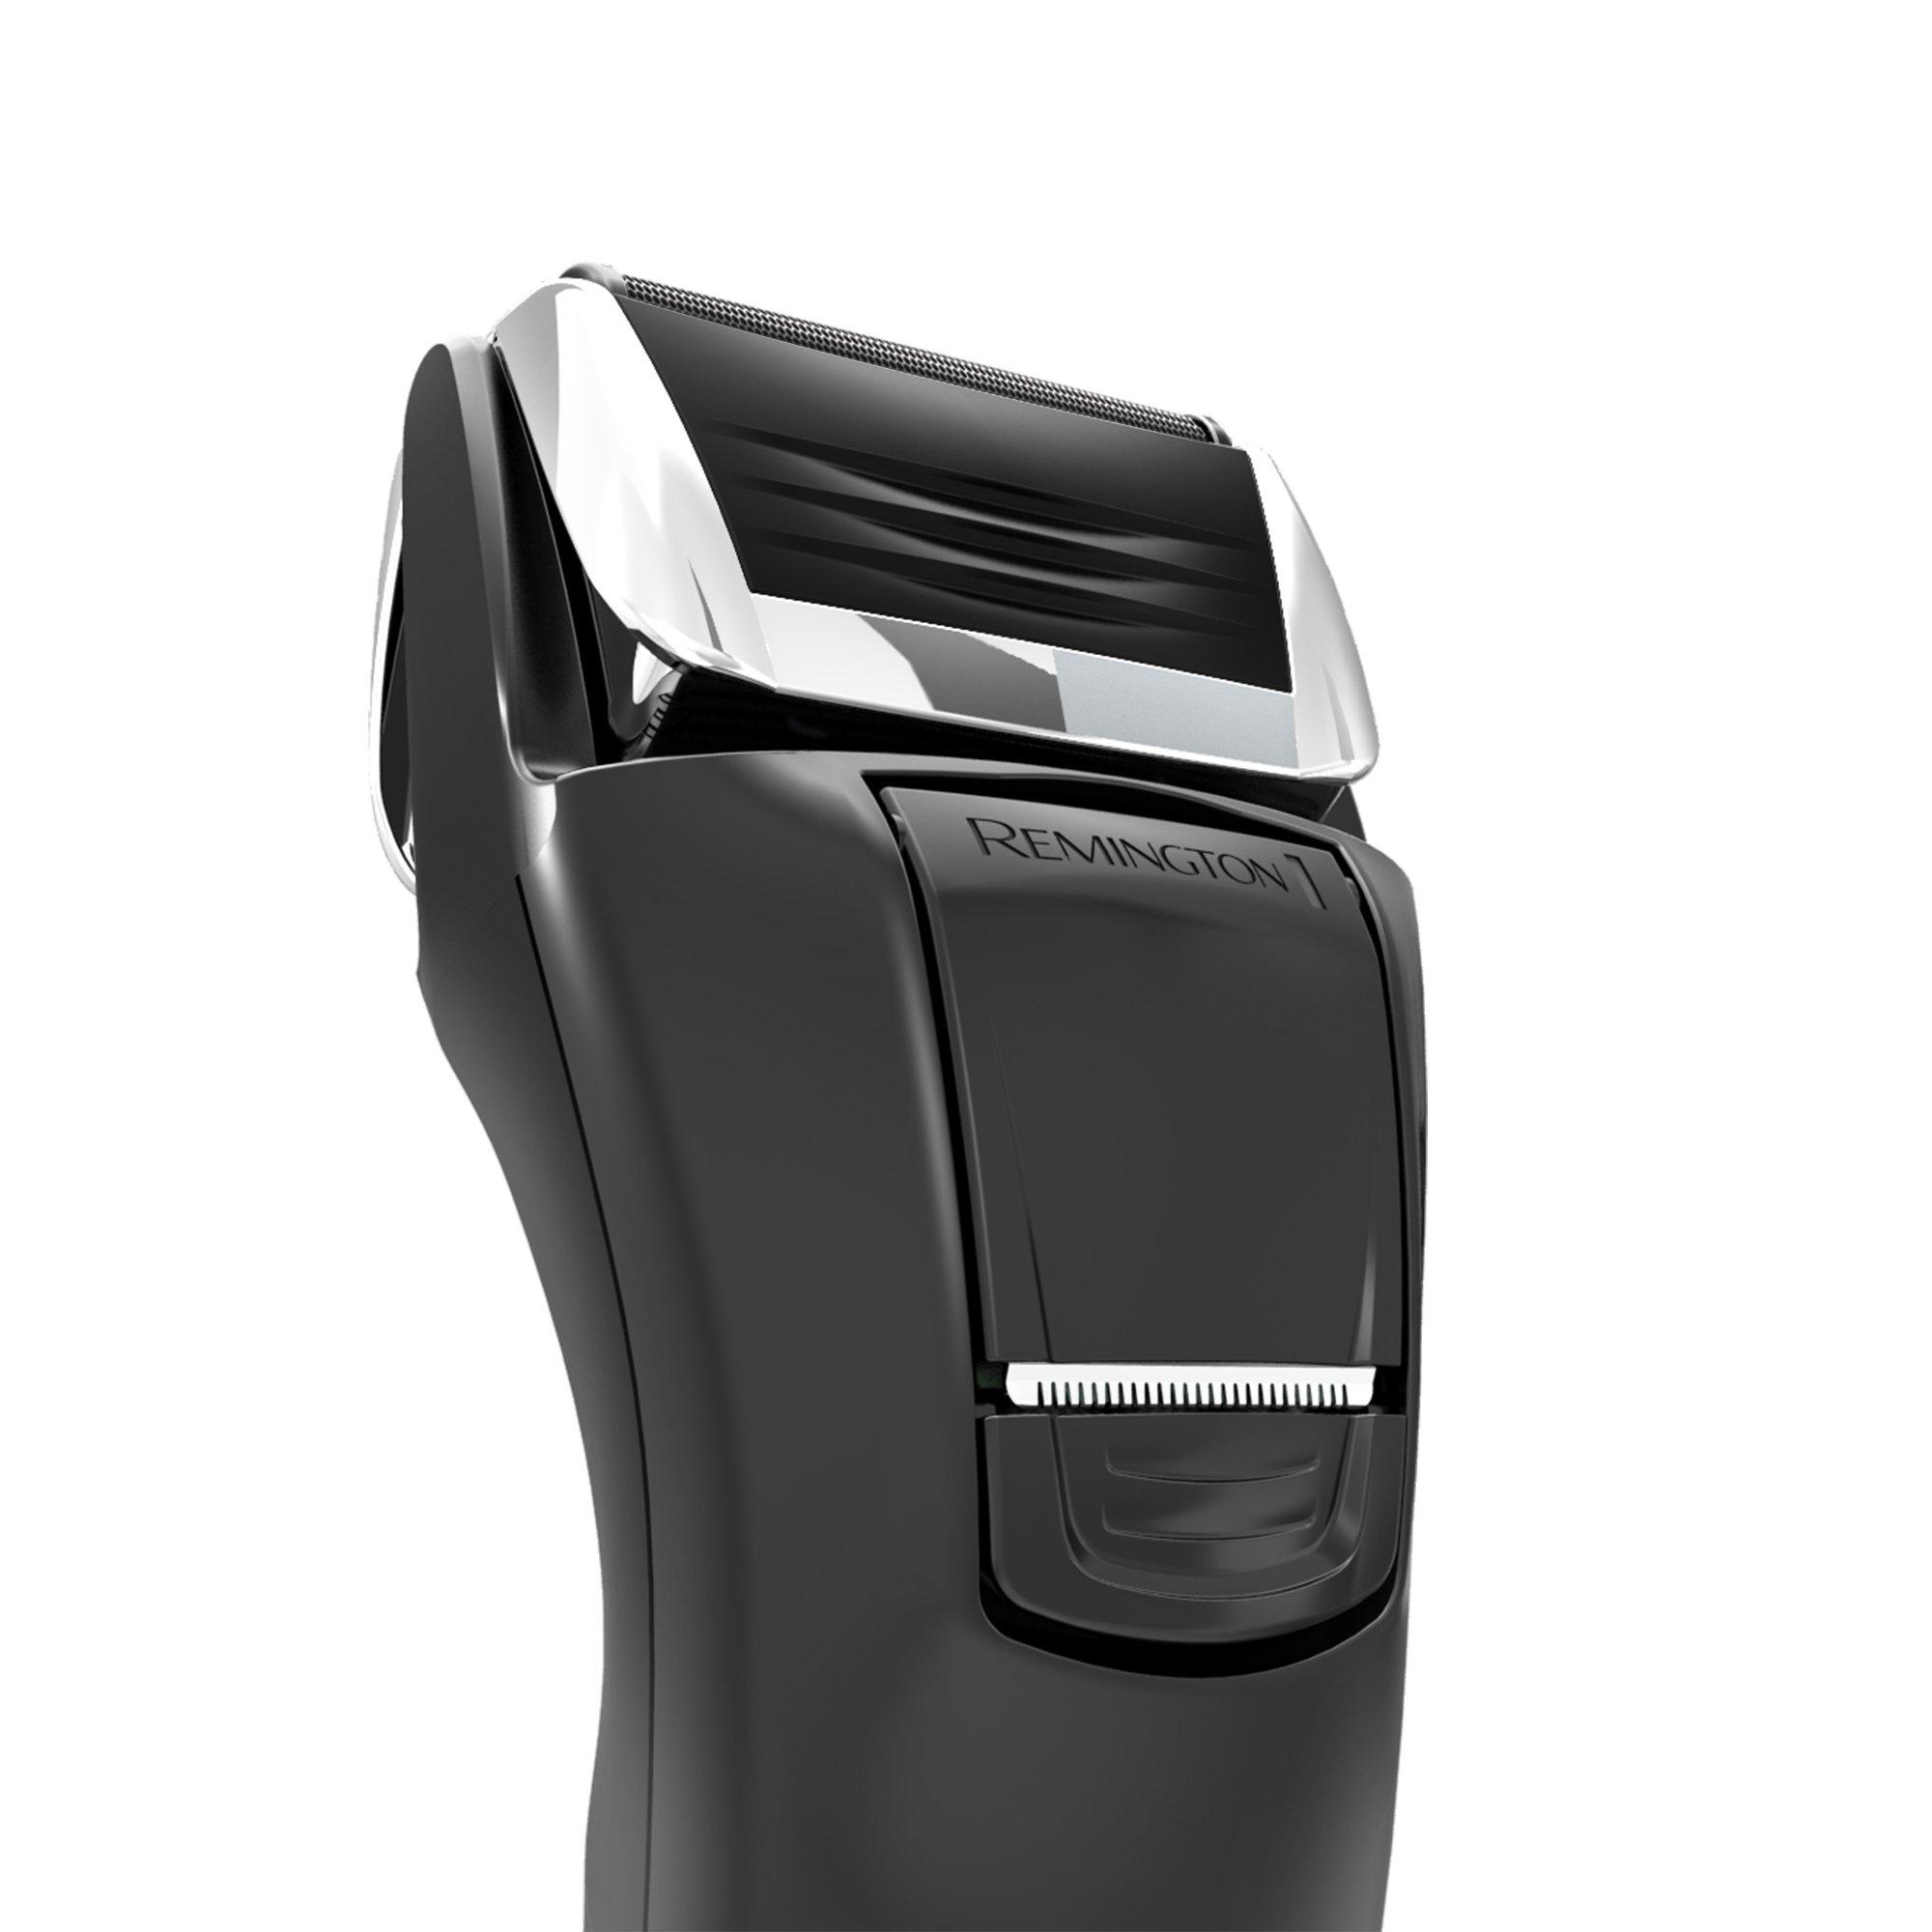 Remington F5-5800 Foil Shaver, Men's Electric Razor, Electric Shaver, Black by Remington (Image #3)